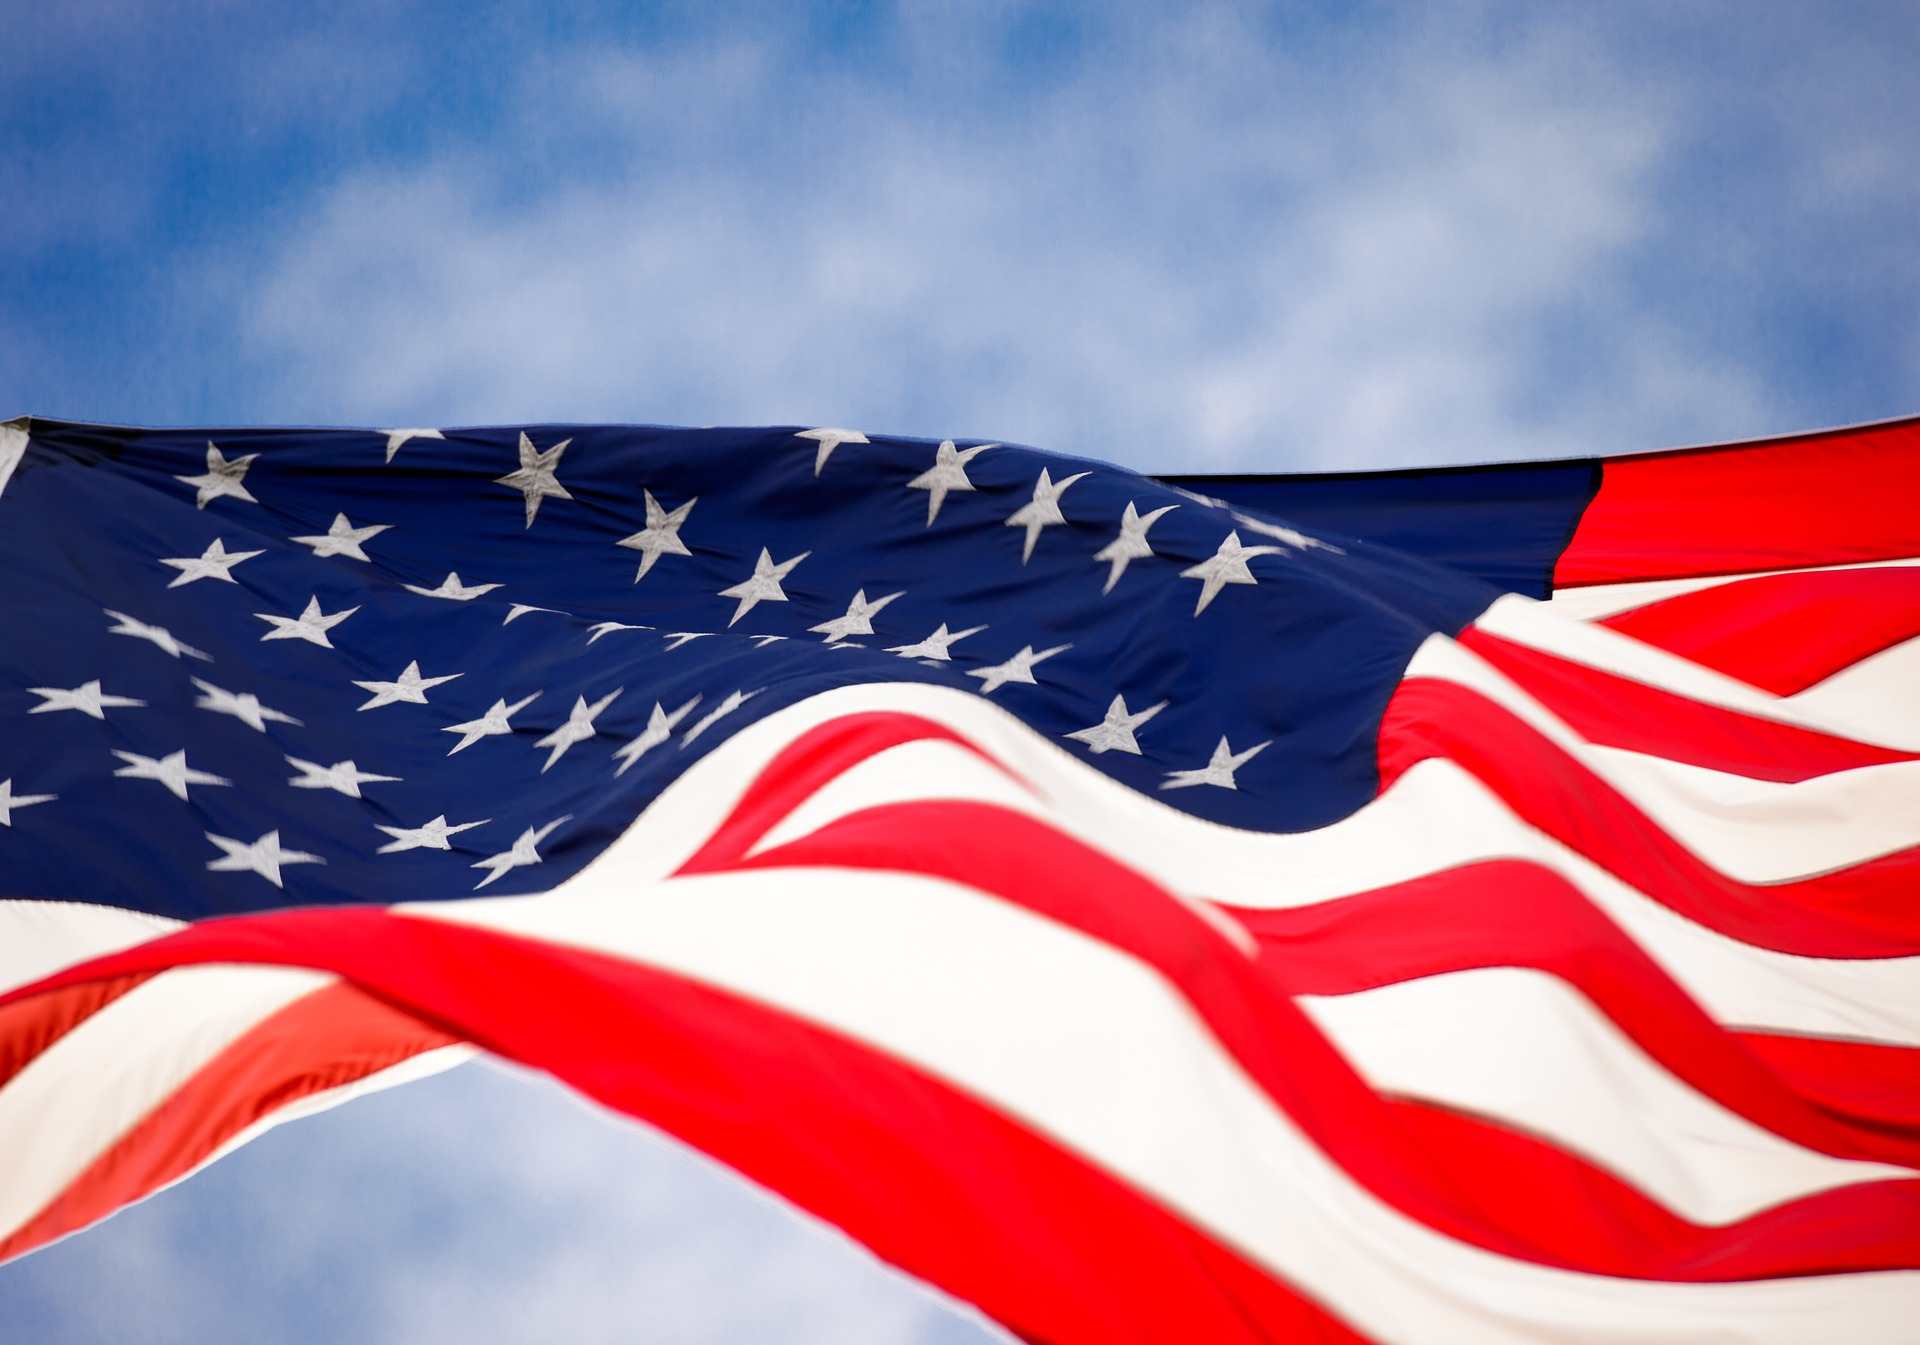 САЩ знаме